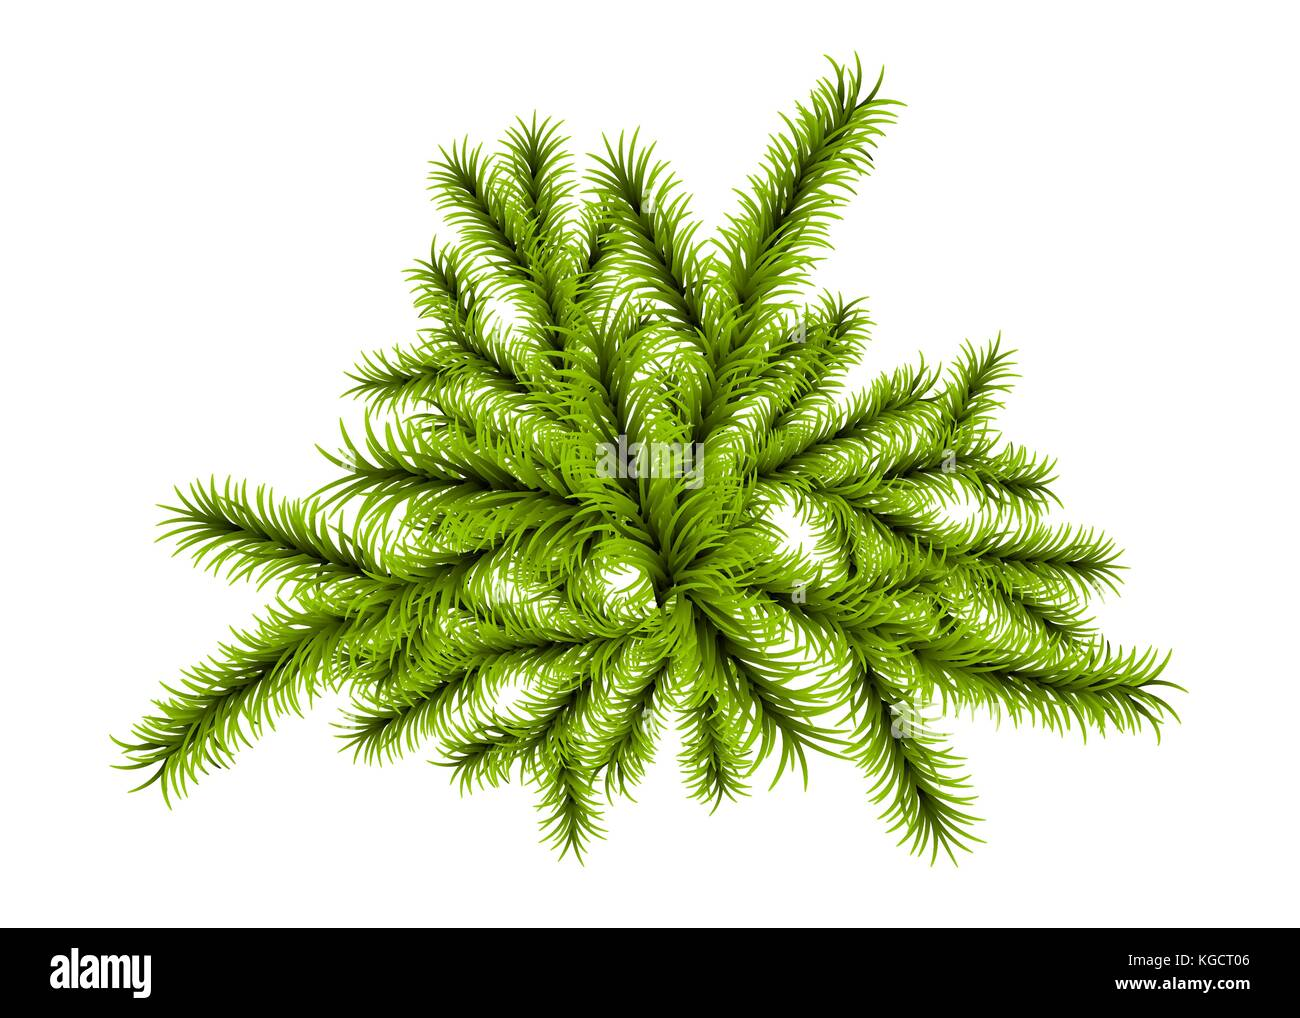 Christmas Tree Branch Template Stock Vector Art Illustration